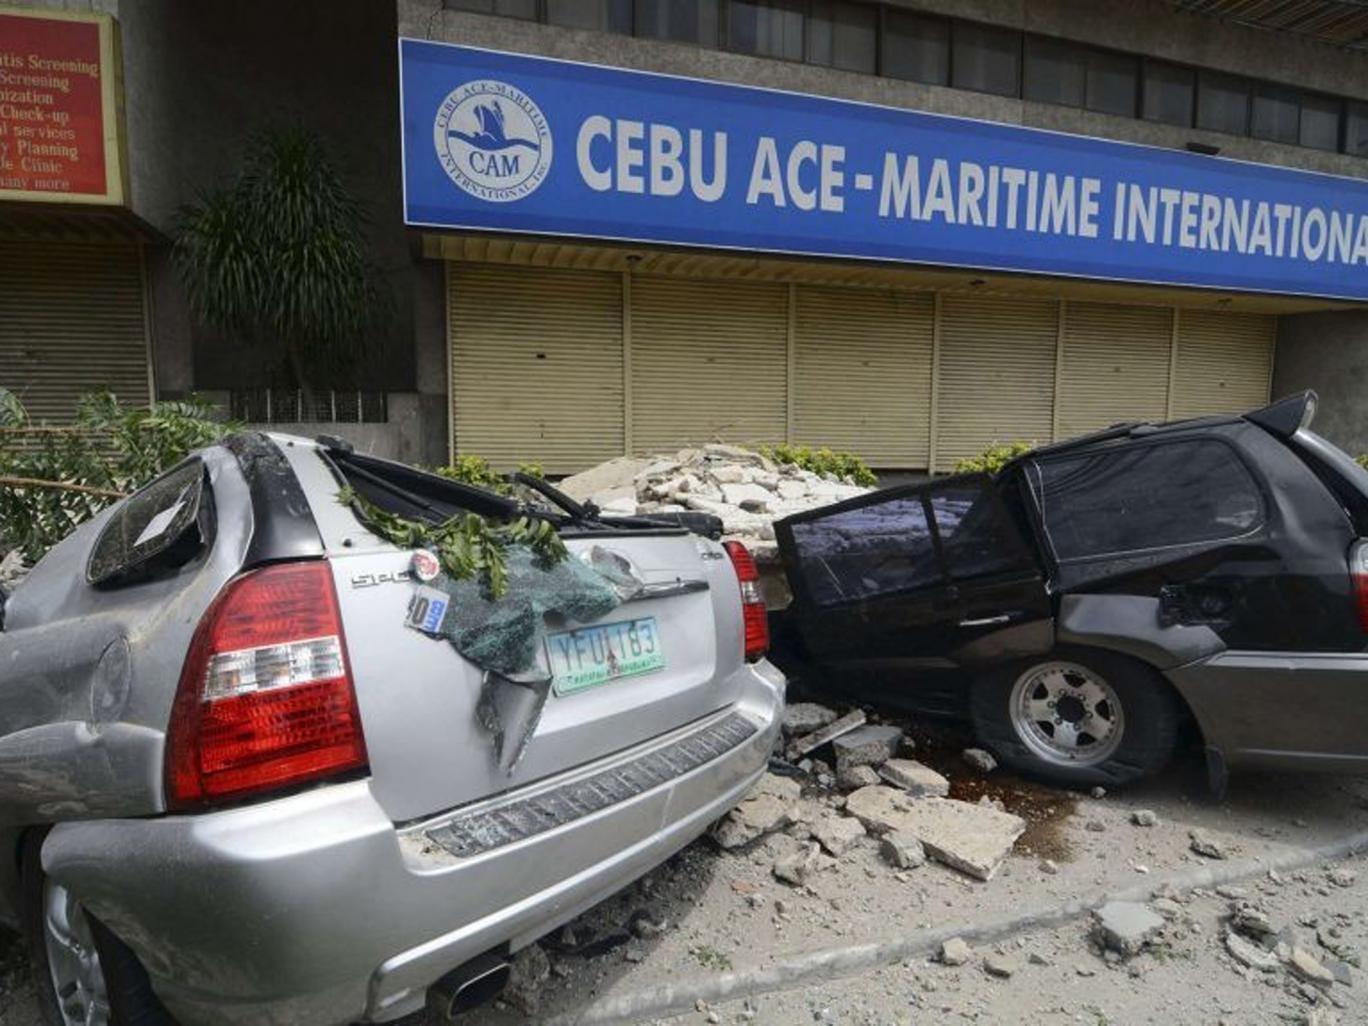 Vehicles damaged by falling debris after an earthquake struck Cebu city